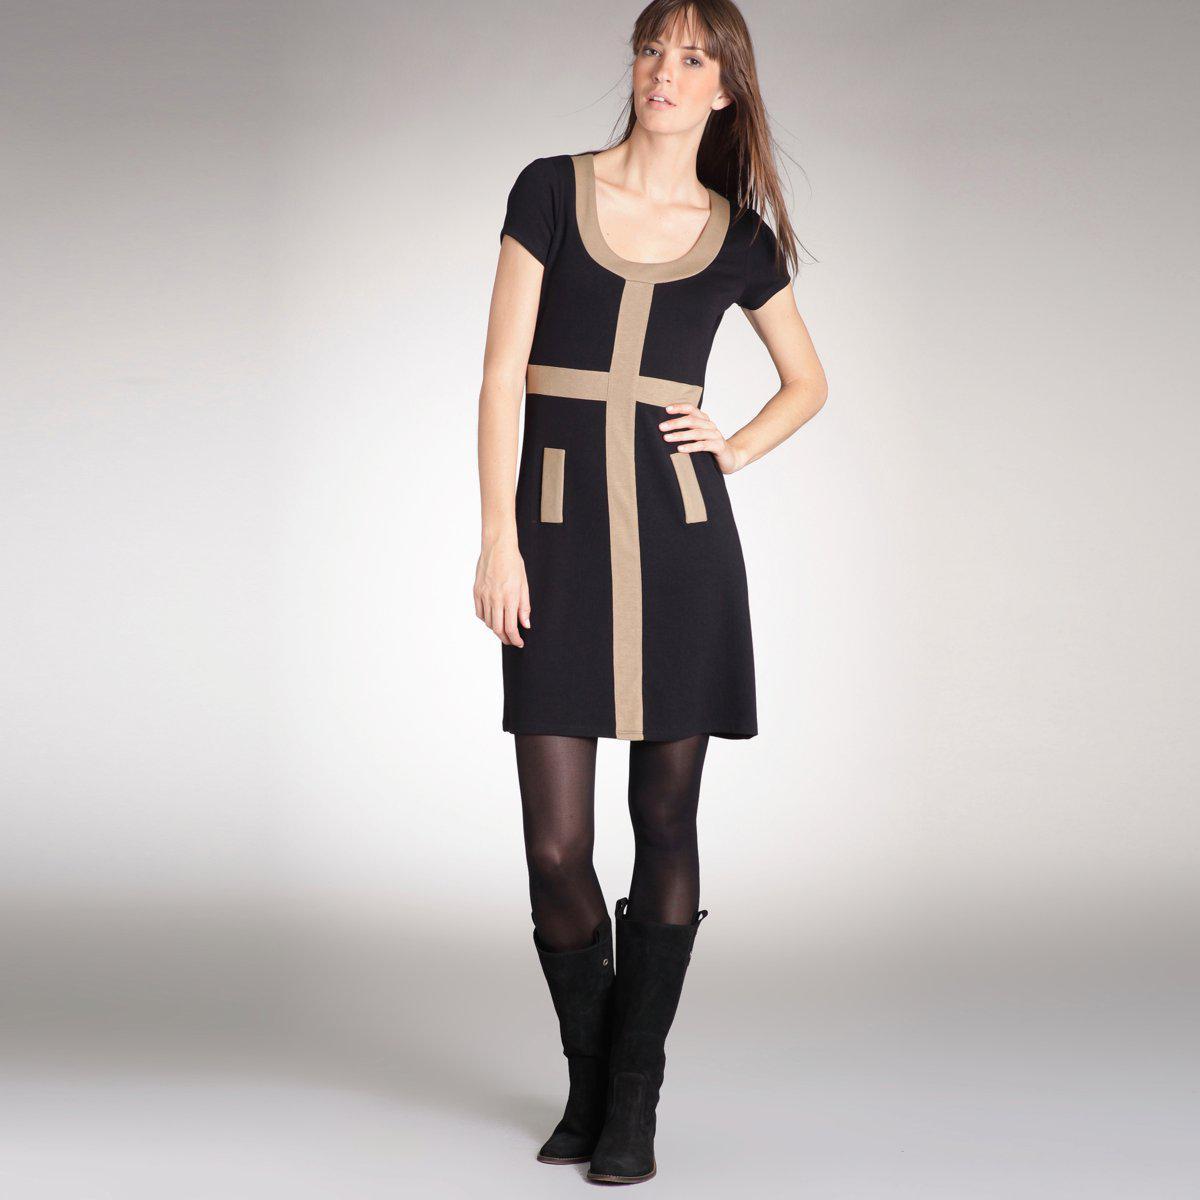 bradyna foremata 228 - Βραδυνα Φορεματα LaRedoute Φθινόπωρο 2011 Κωδ. 324264452